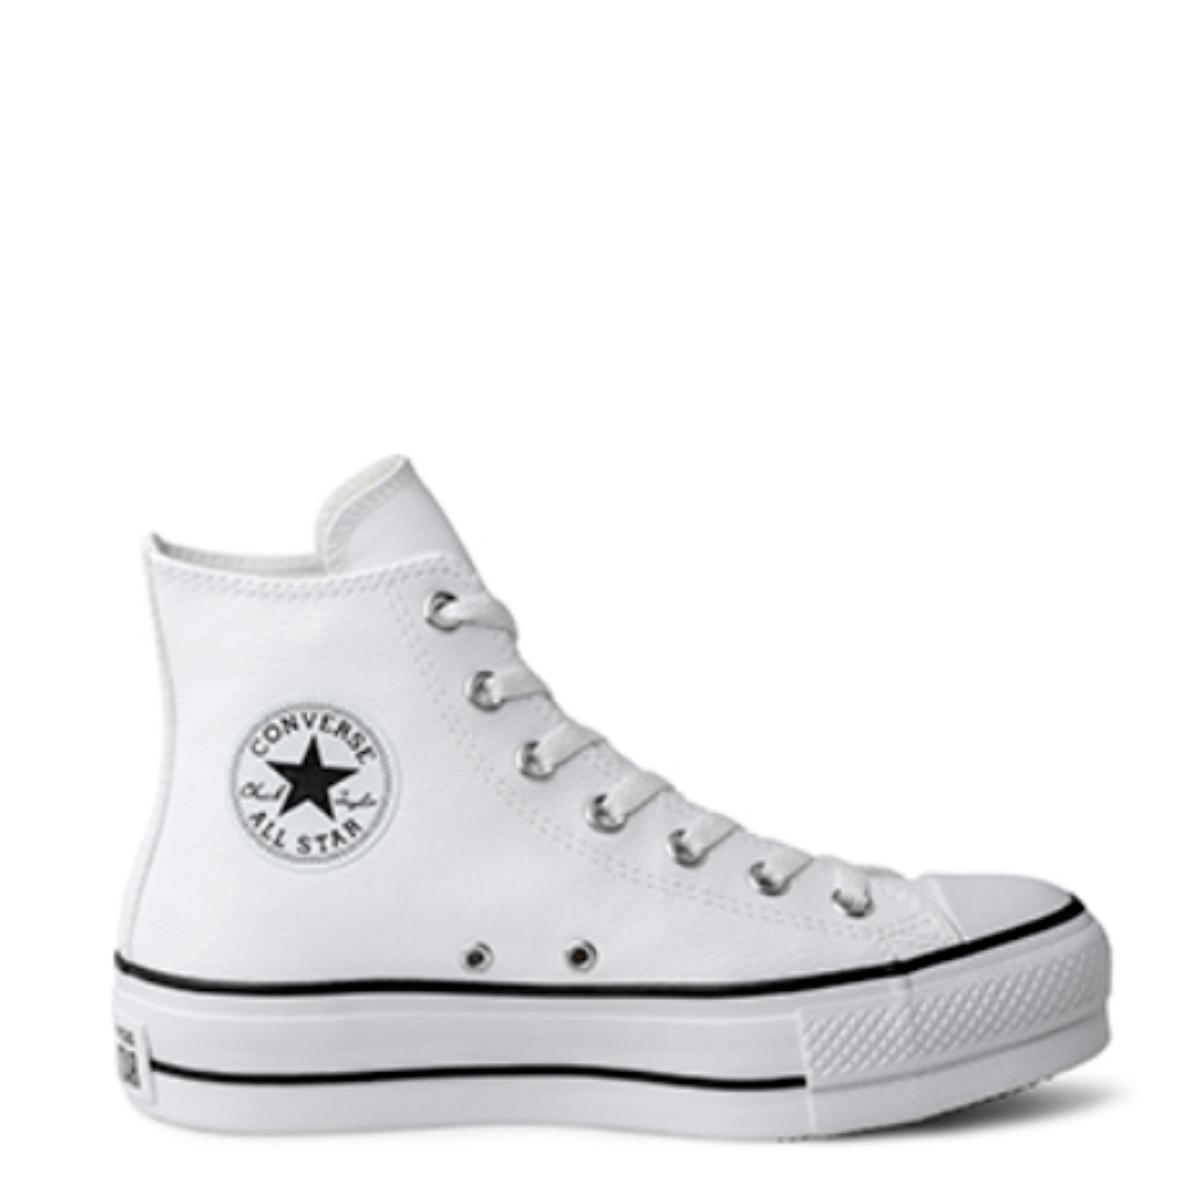 Tênis Converse Chuck Taylor All Star Platform Lift Hi Branco Preto CT09820001